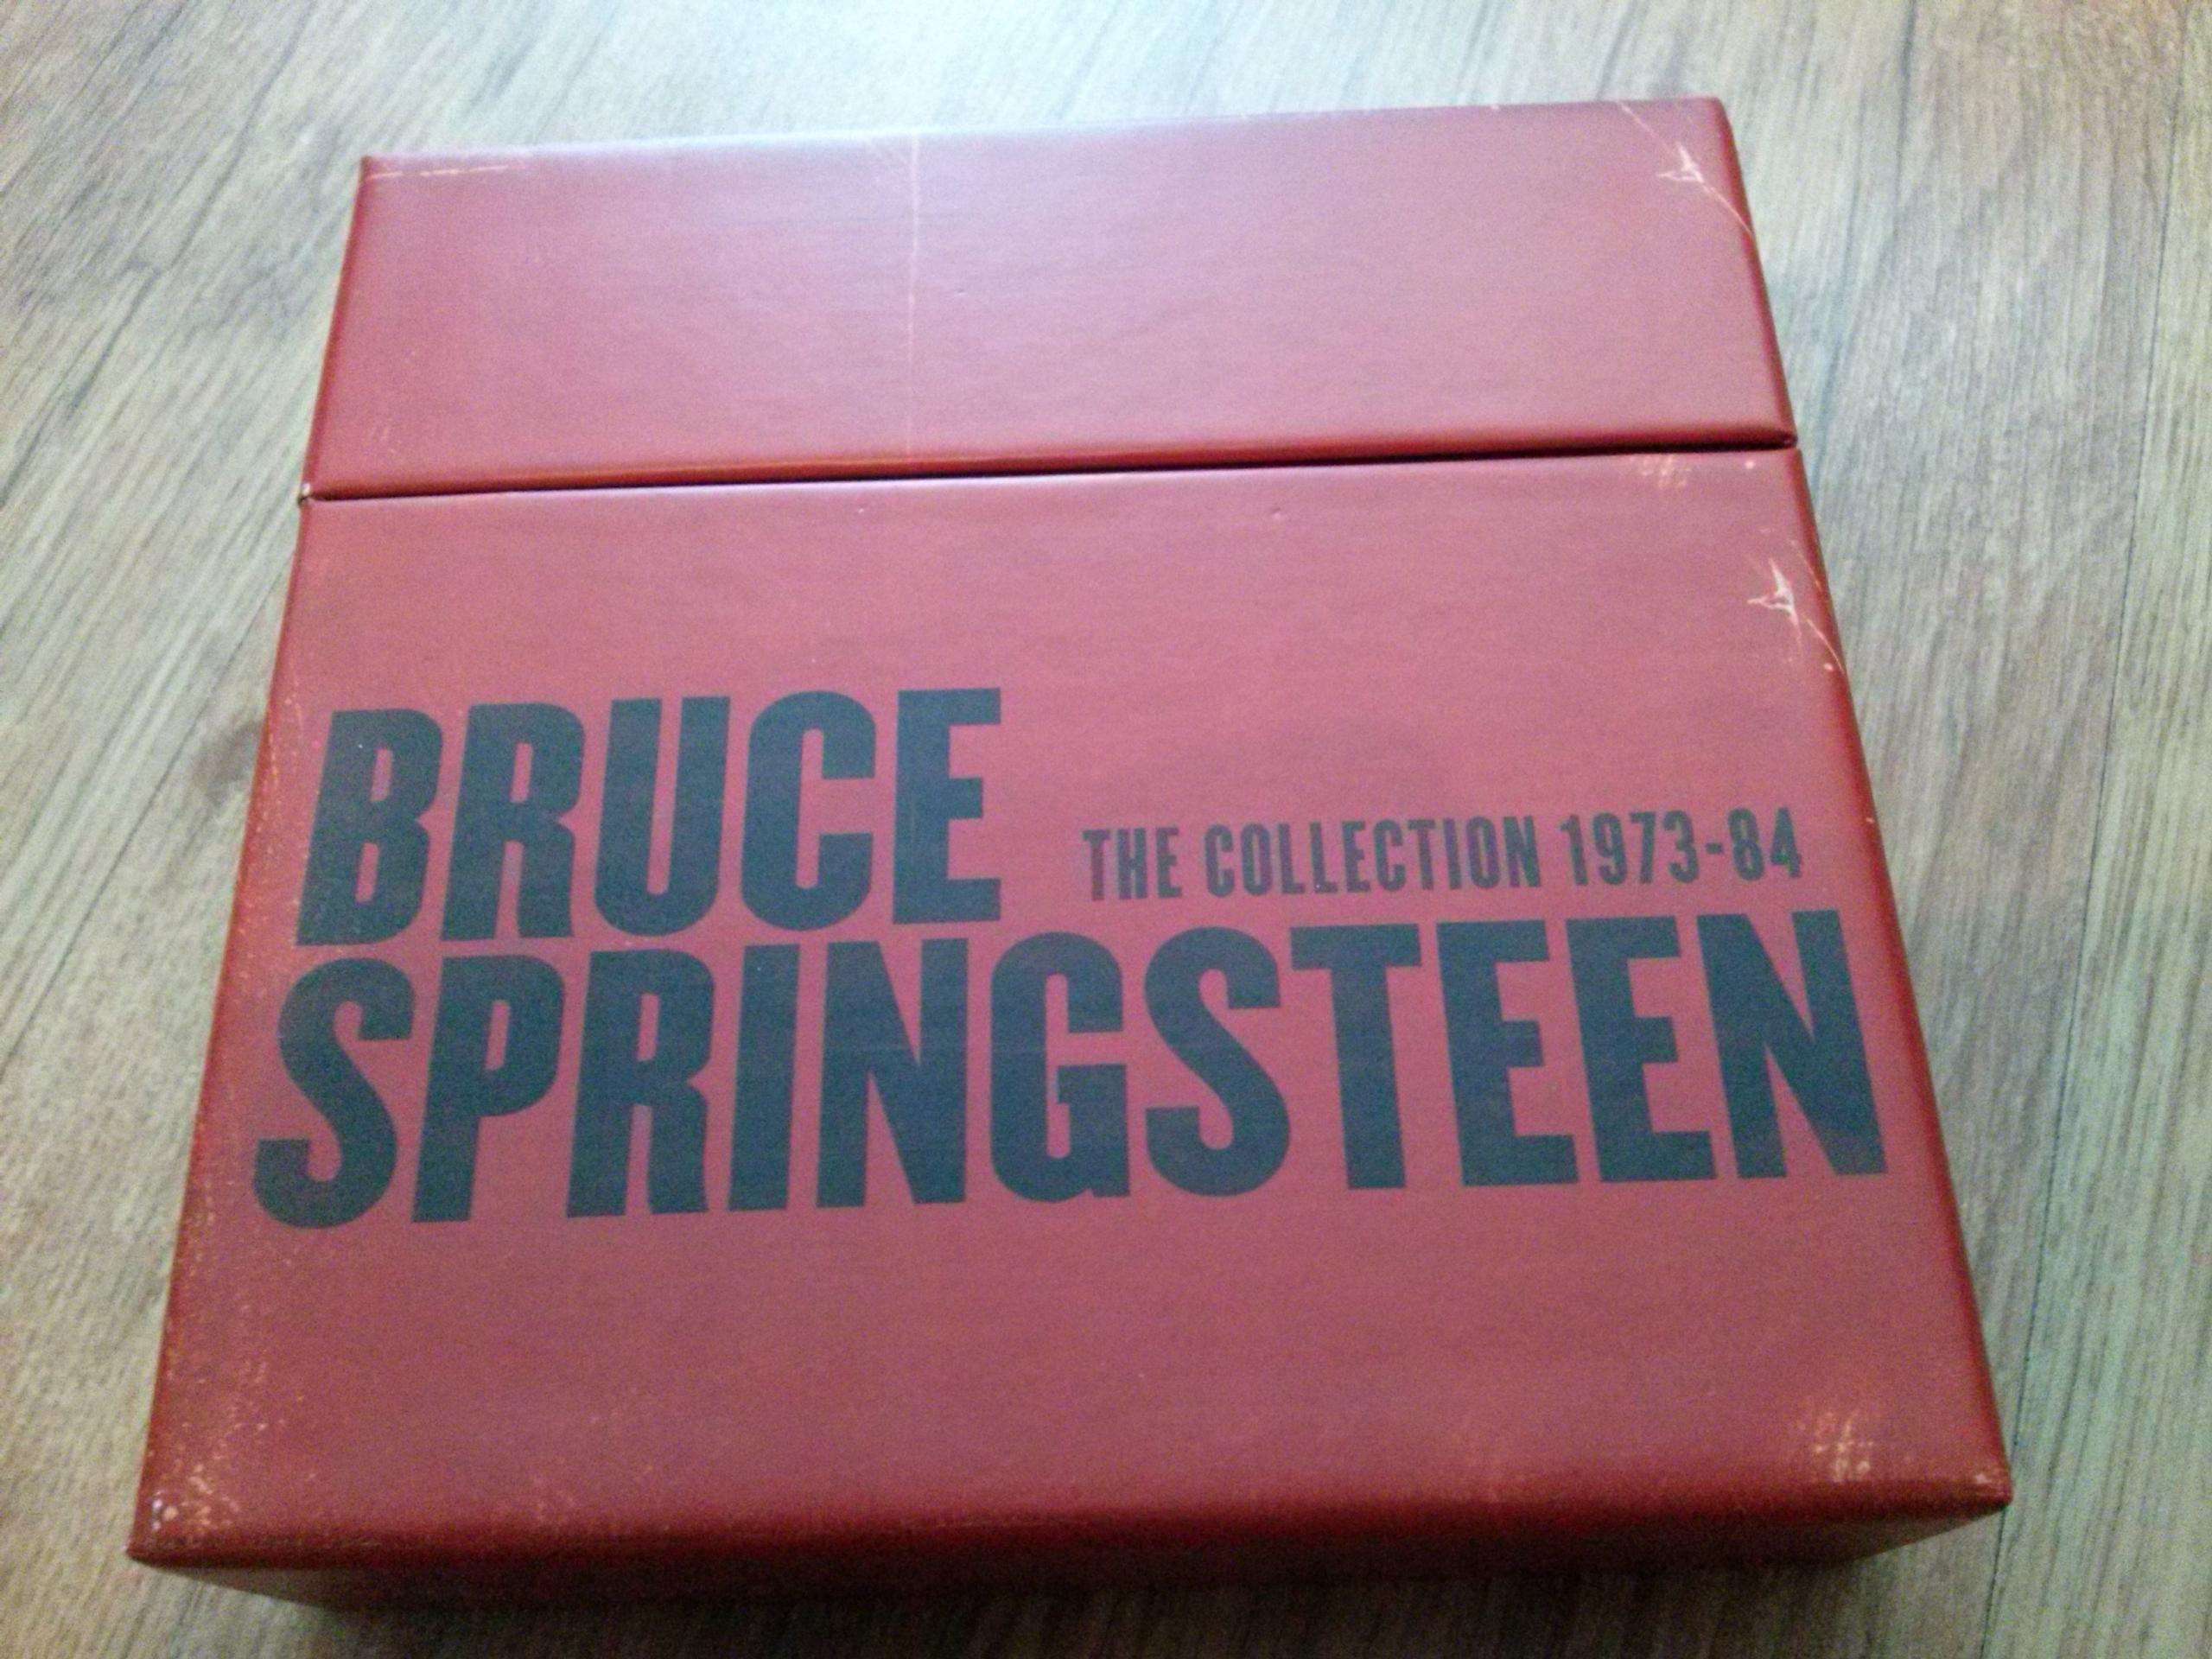 Bruce Springsteen pudełko box na płyty cd mini lp